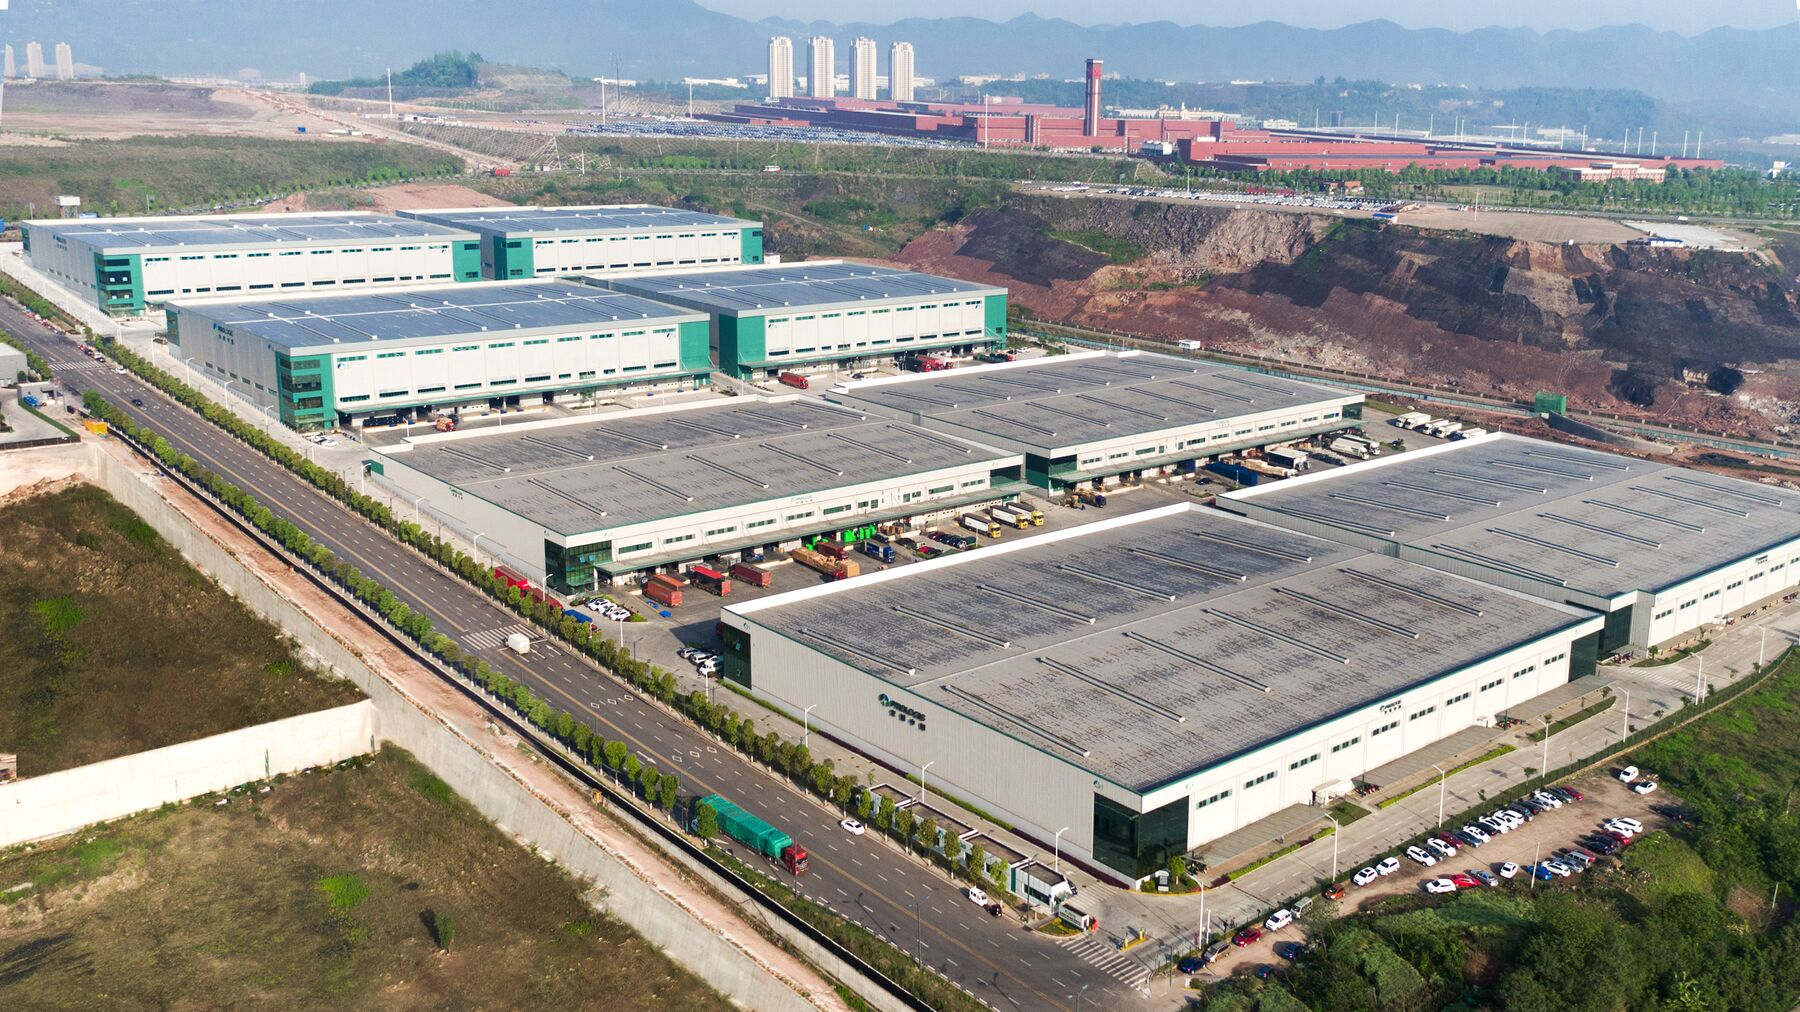 DPM-Chongqing-Liangjiang-Logistics-Center_-CNW00702_-021420.jpg